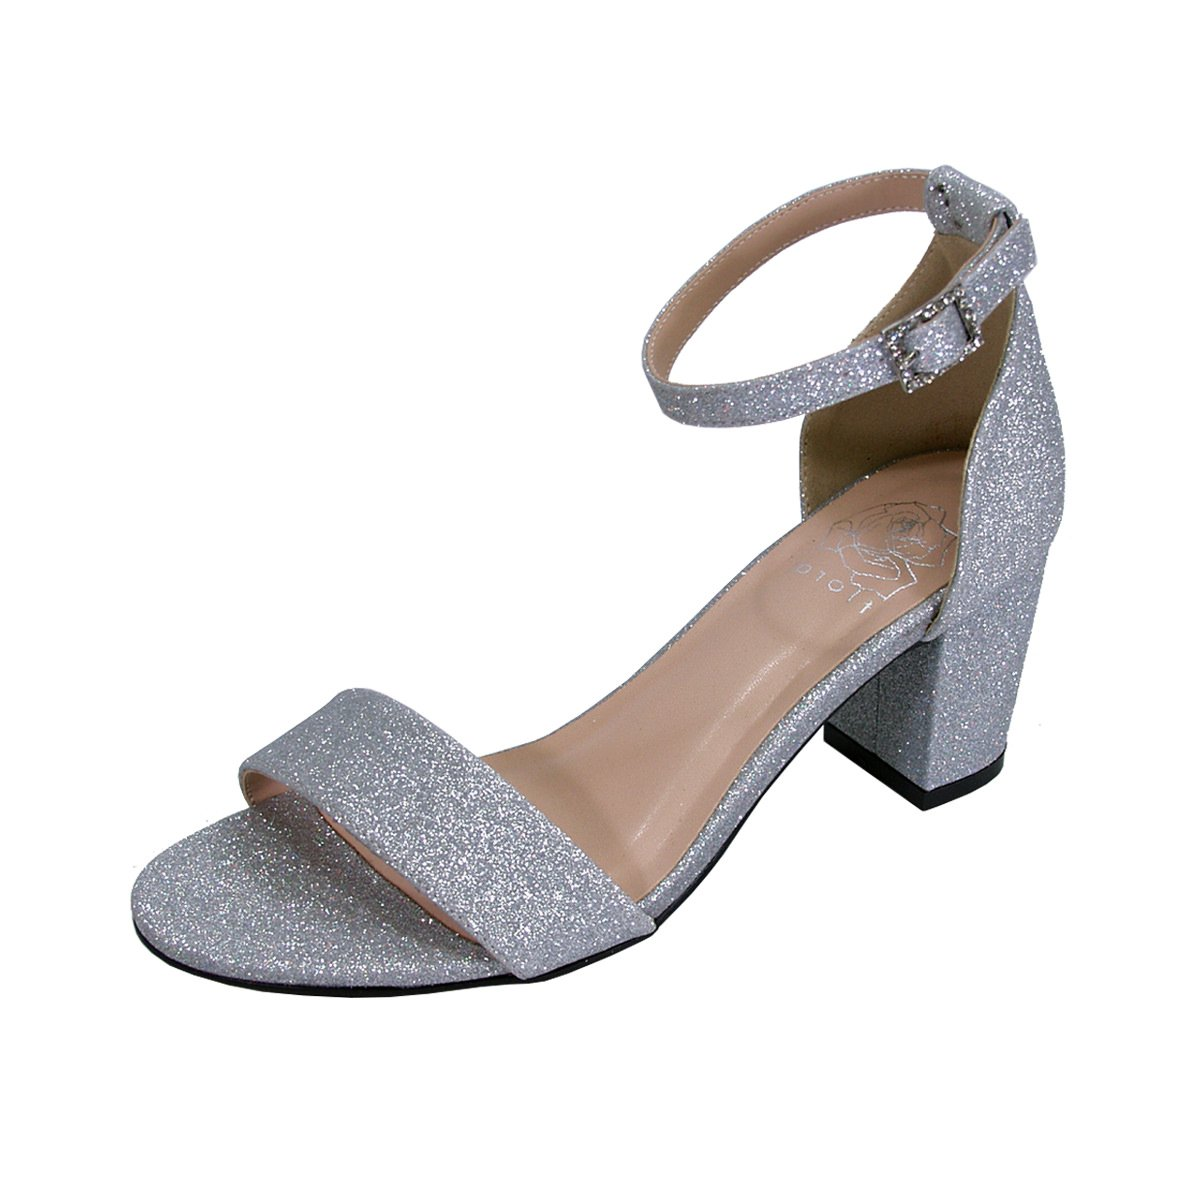 Women's Adele Silver Glitter Satin Wide Width Block Heel Ankle Strap Dress Sandals - DeluxeAdultCostumes.com